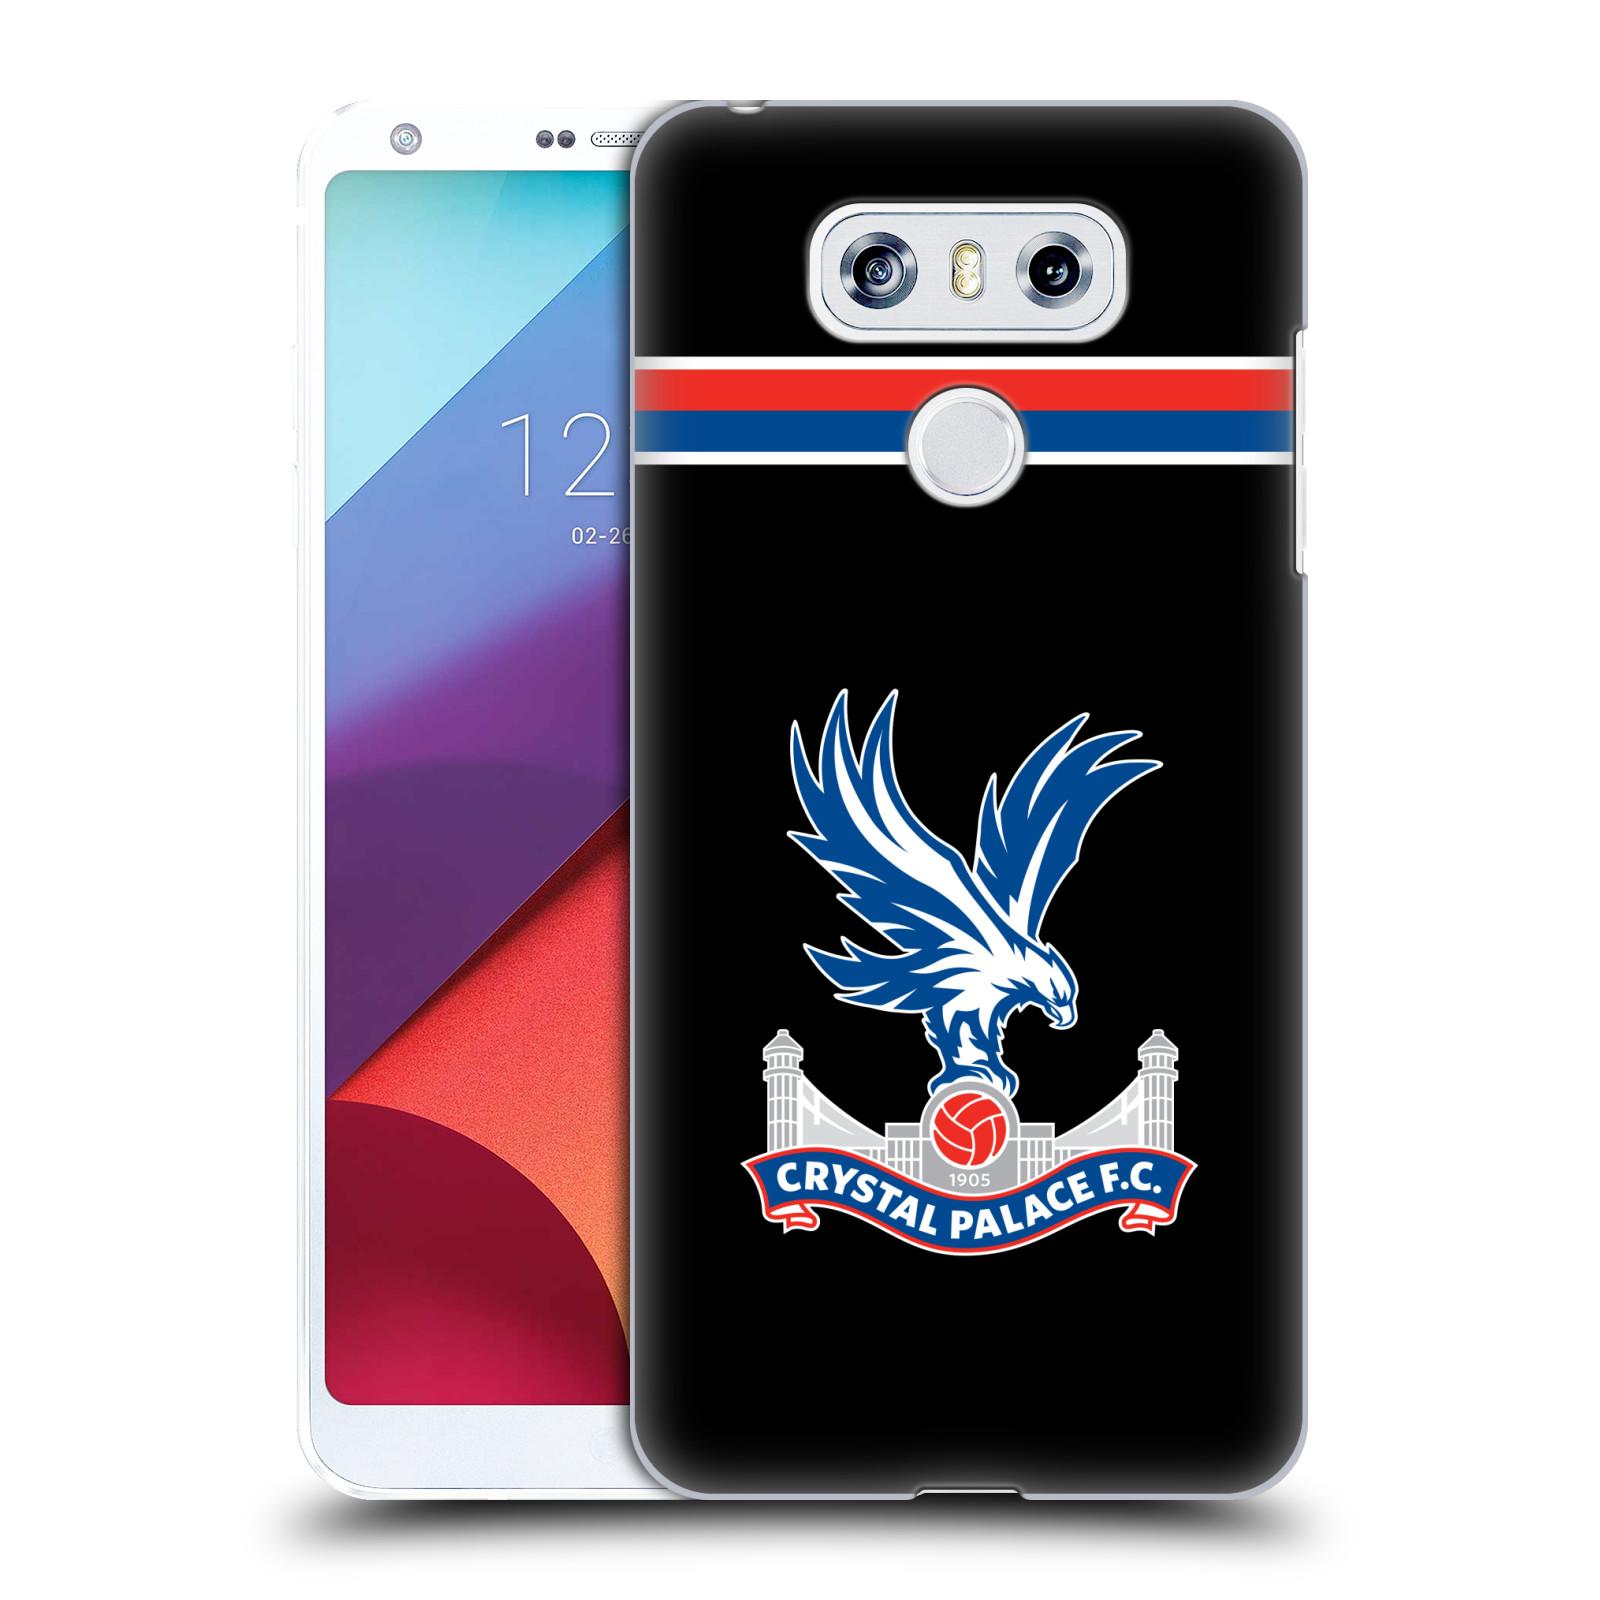 Oficial-Crystal-Palace-FC-2017-18-jugadores-Kit-Funda-Rigida-posterior-para-los-telefonos-LG-1